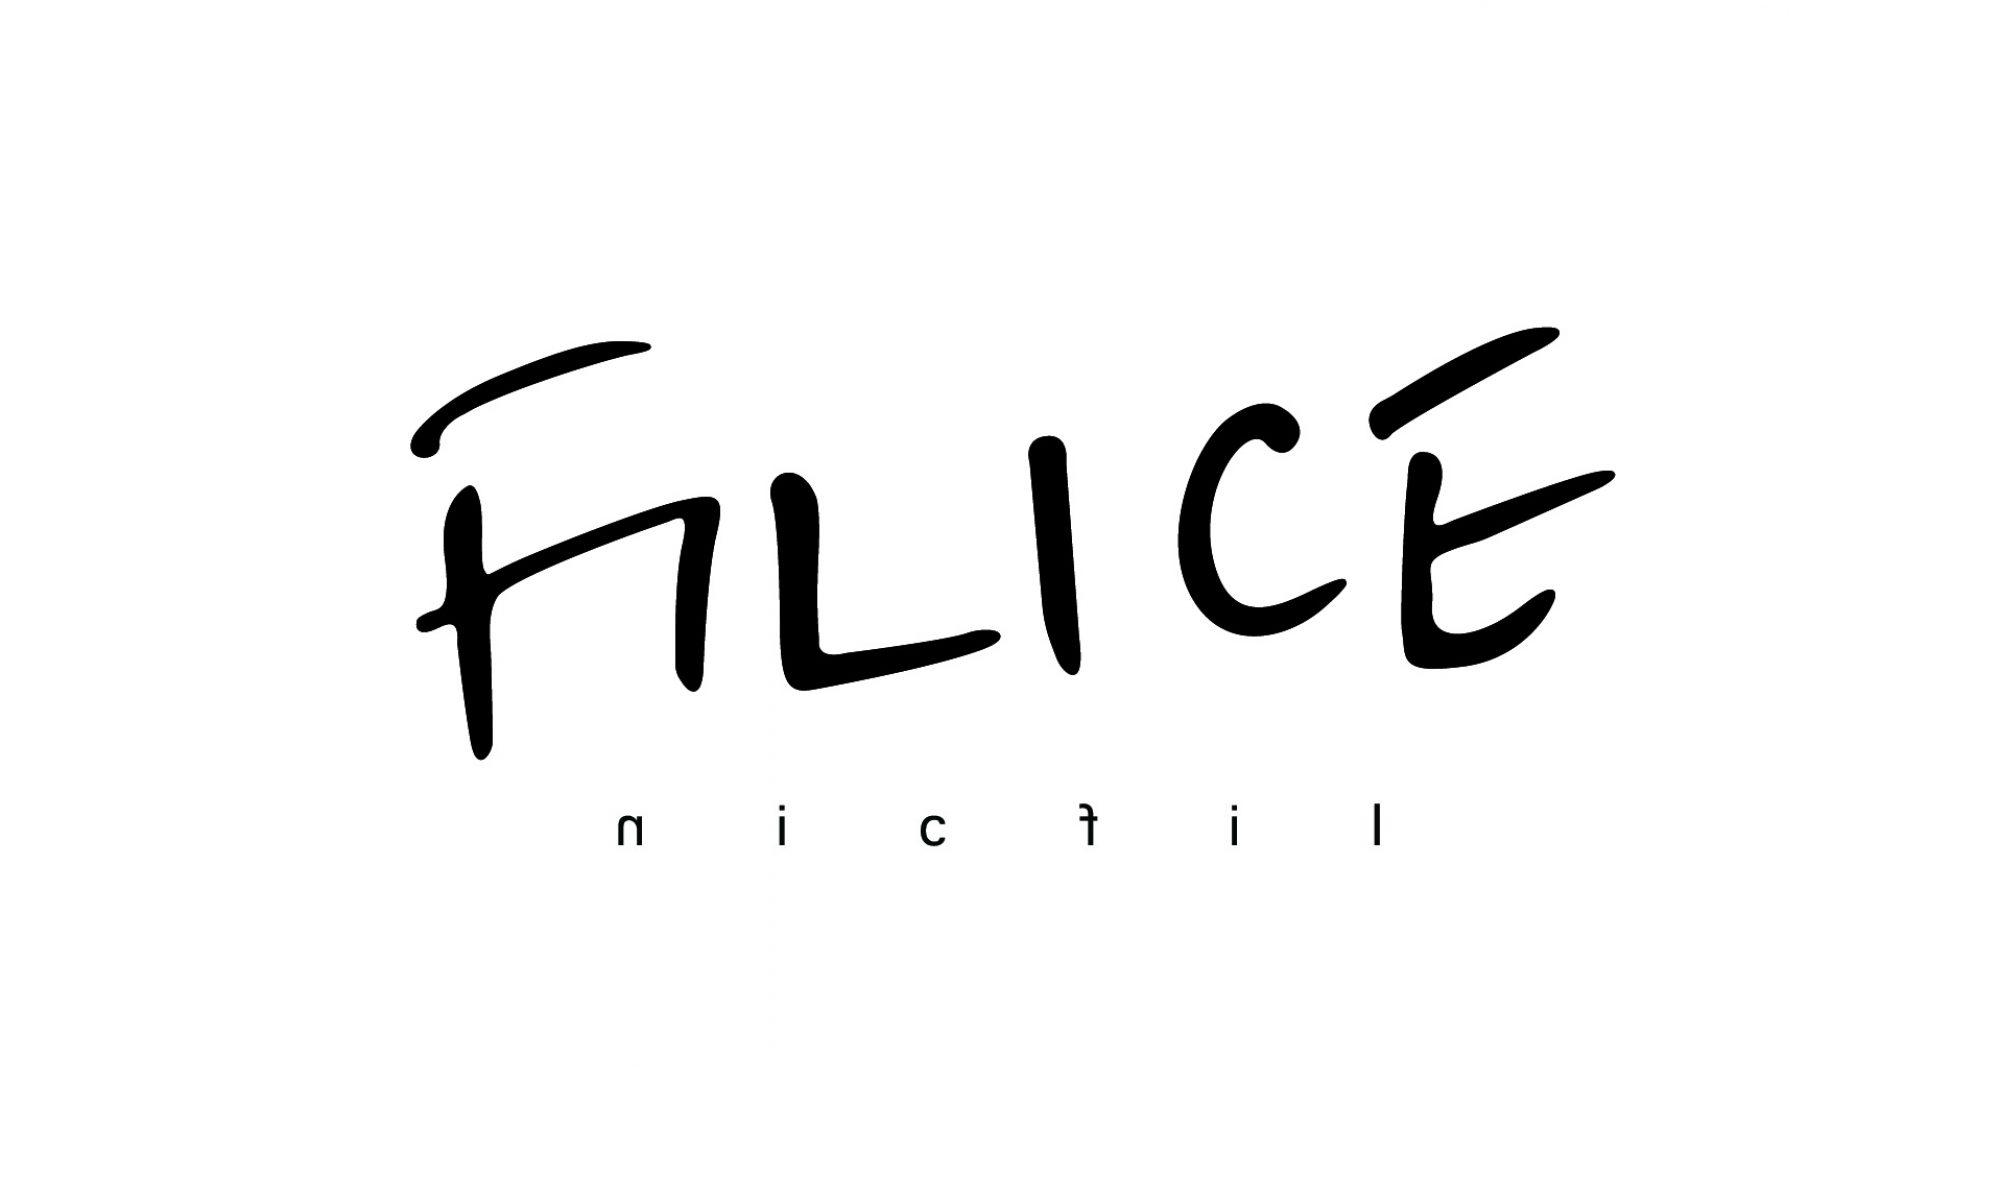 FILICE nicfil